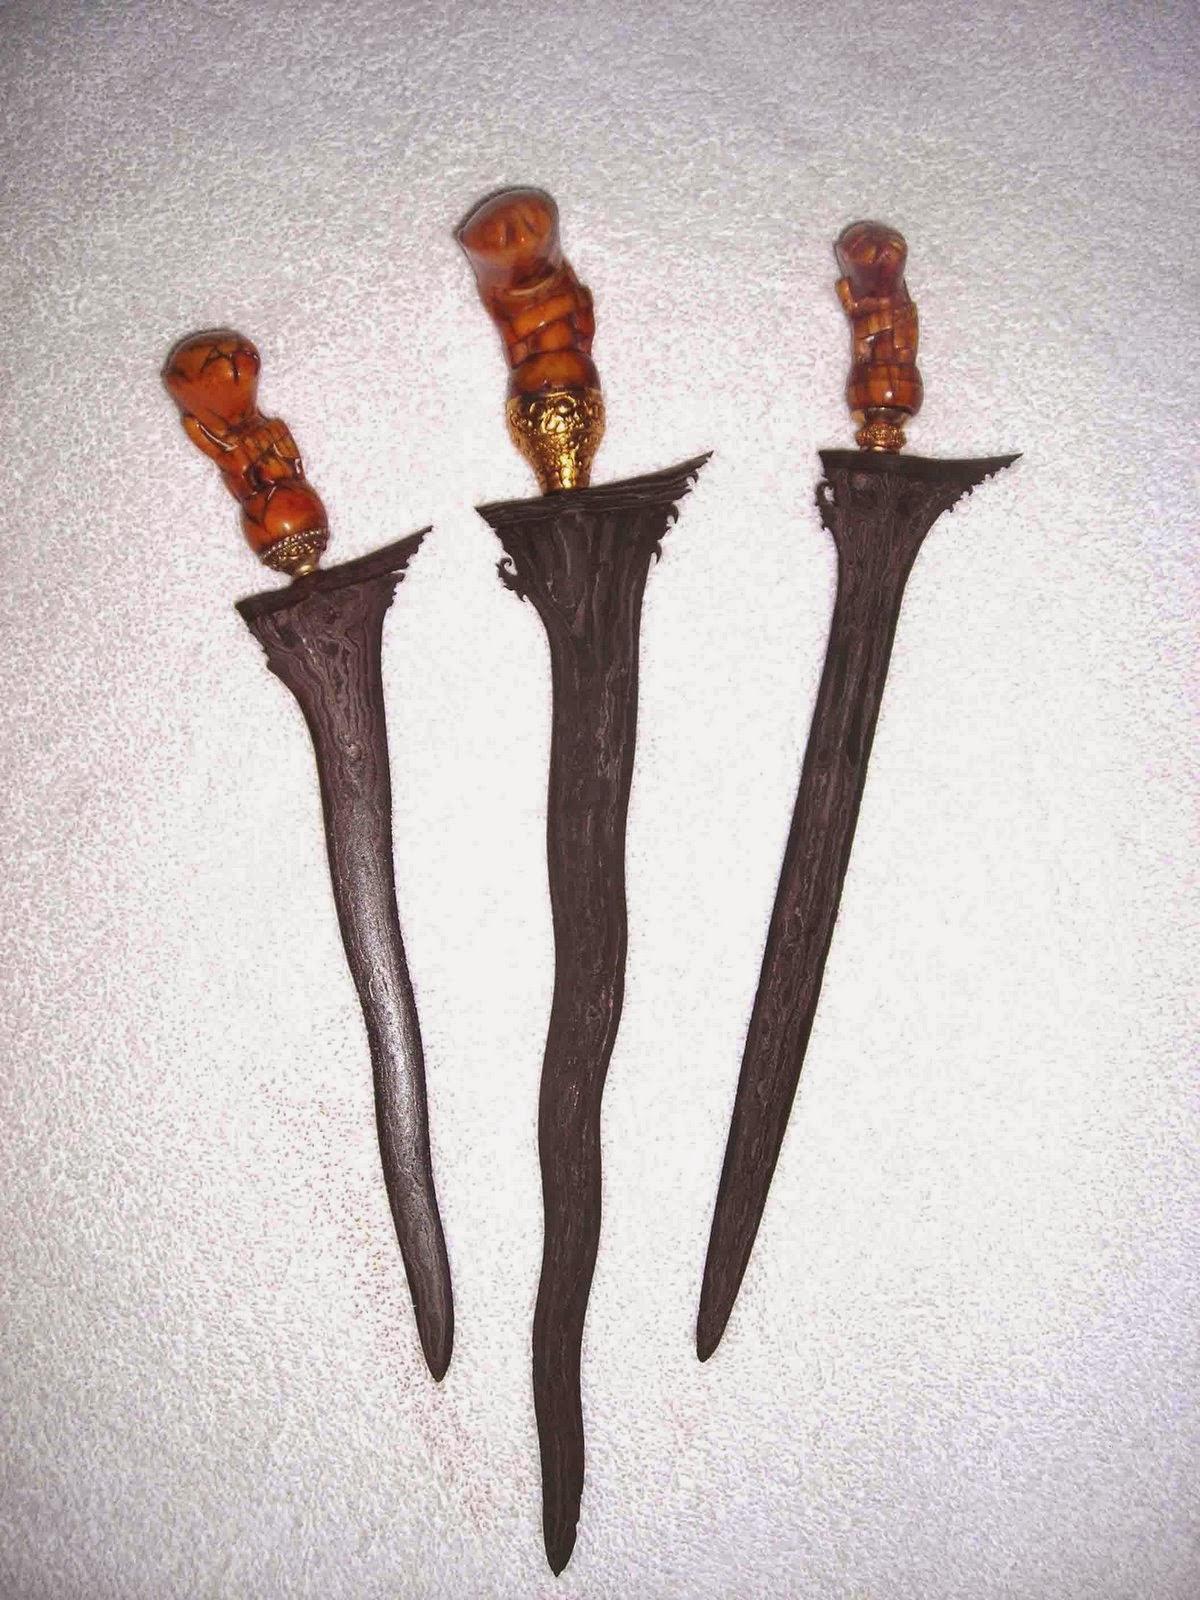 3 Senjata Tradisional Lampung  TradisiKita Indonesia